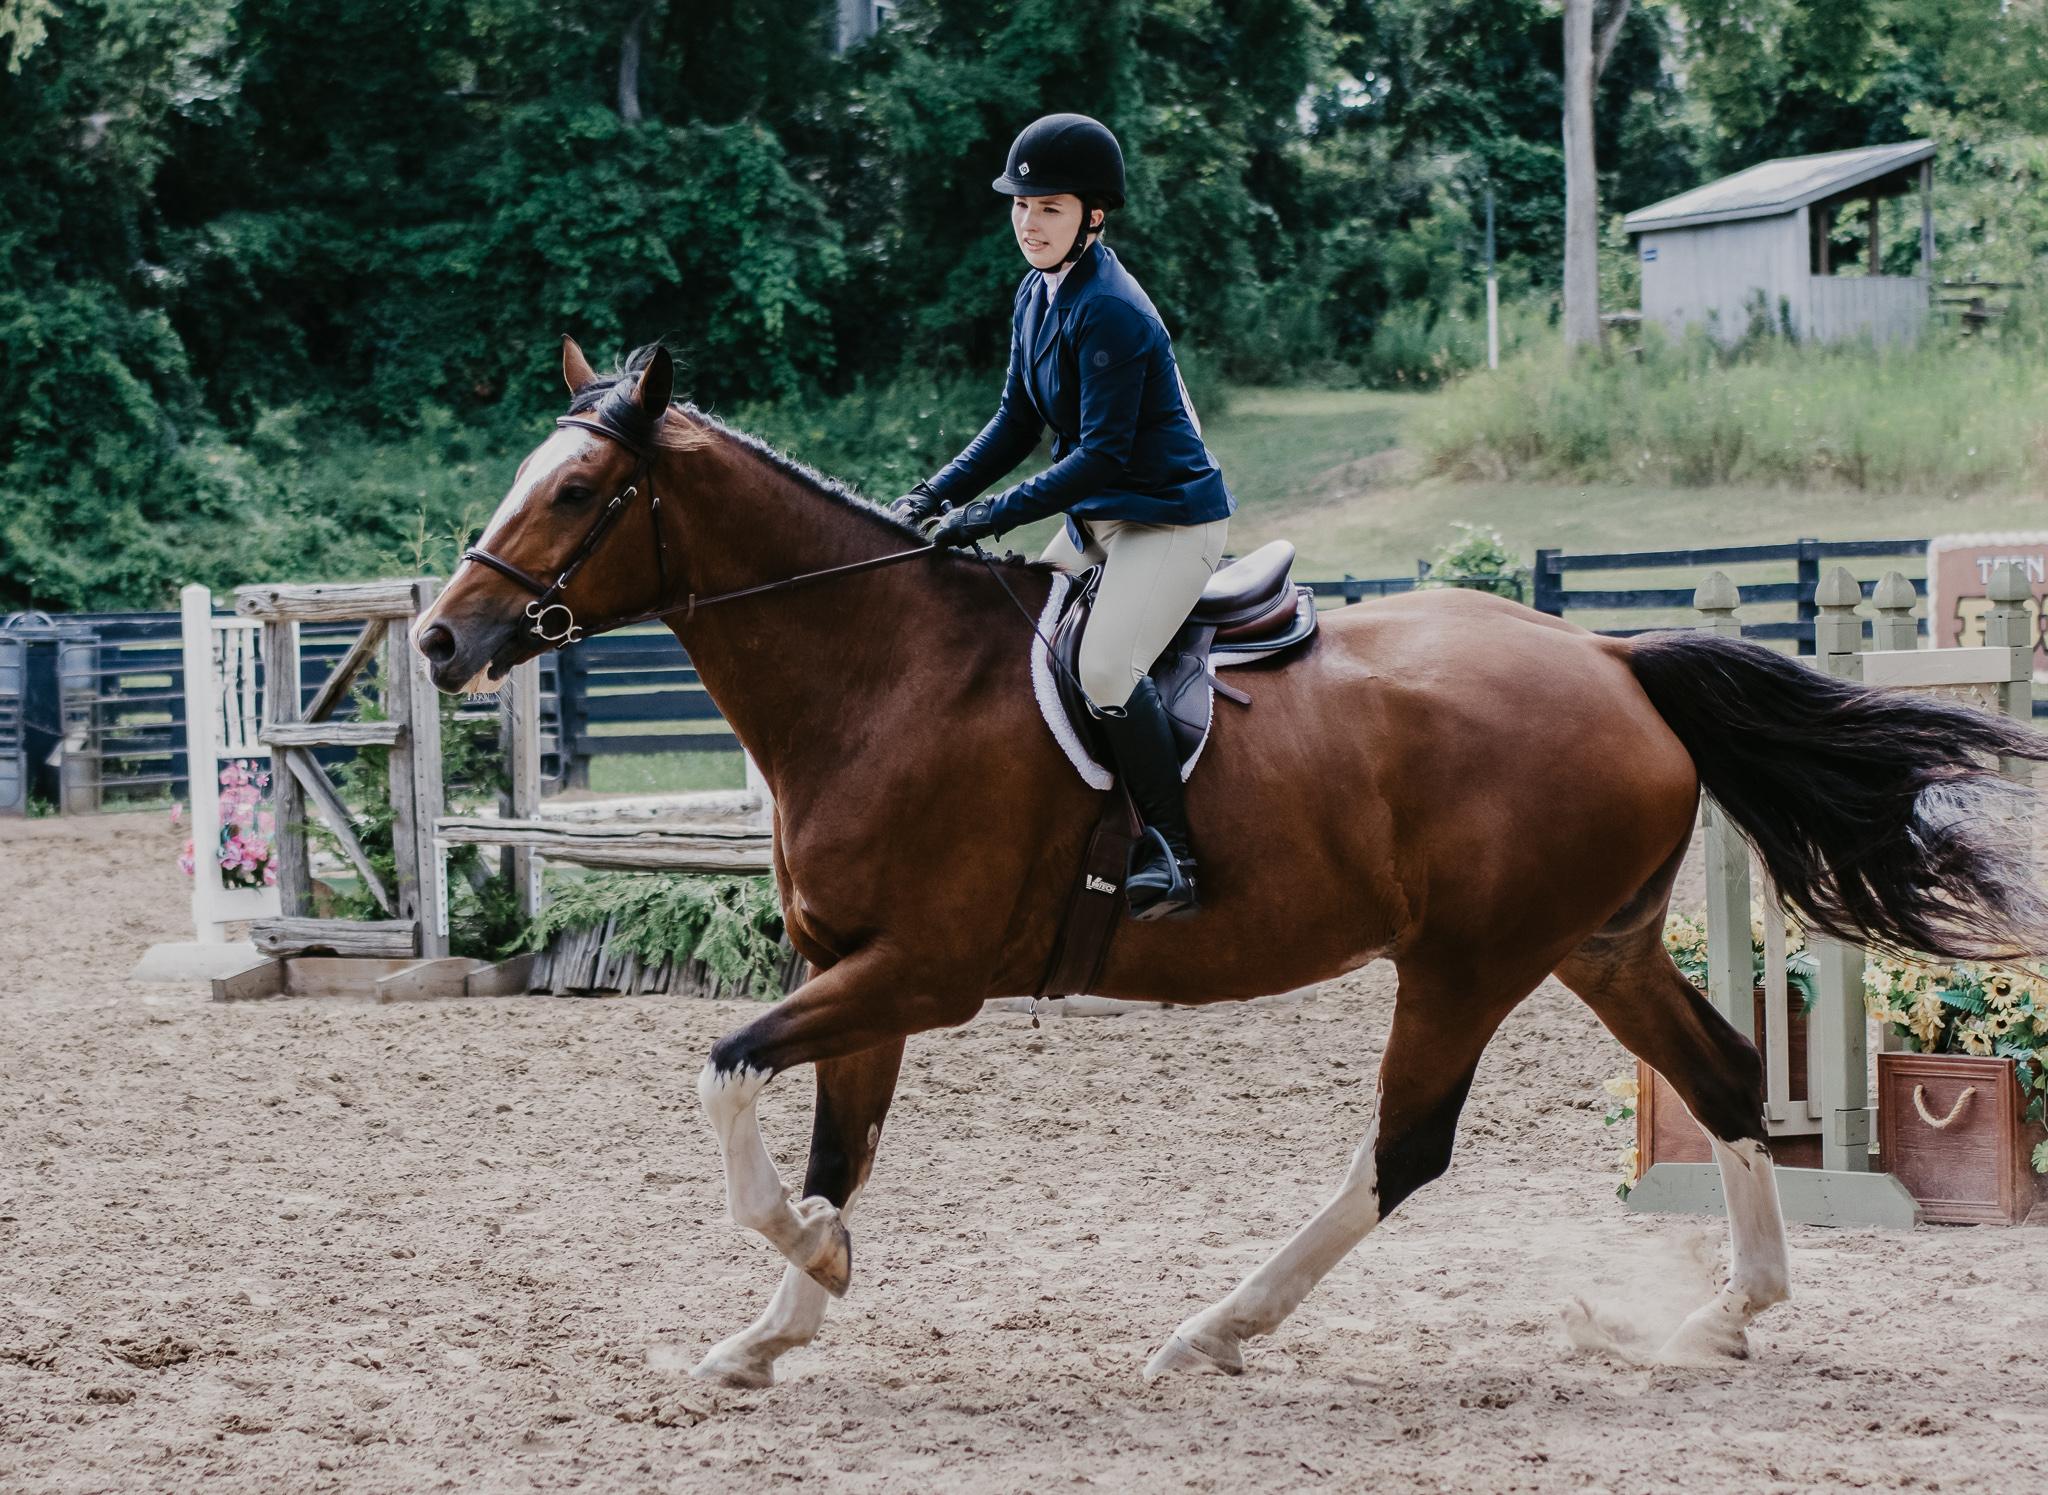 Pure Horse Sense | Ashley Ward | Jumping | Hunter Jumper | Horse Show | Equestrian Blog